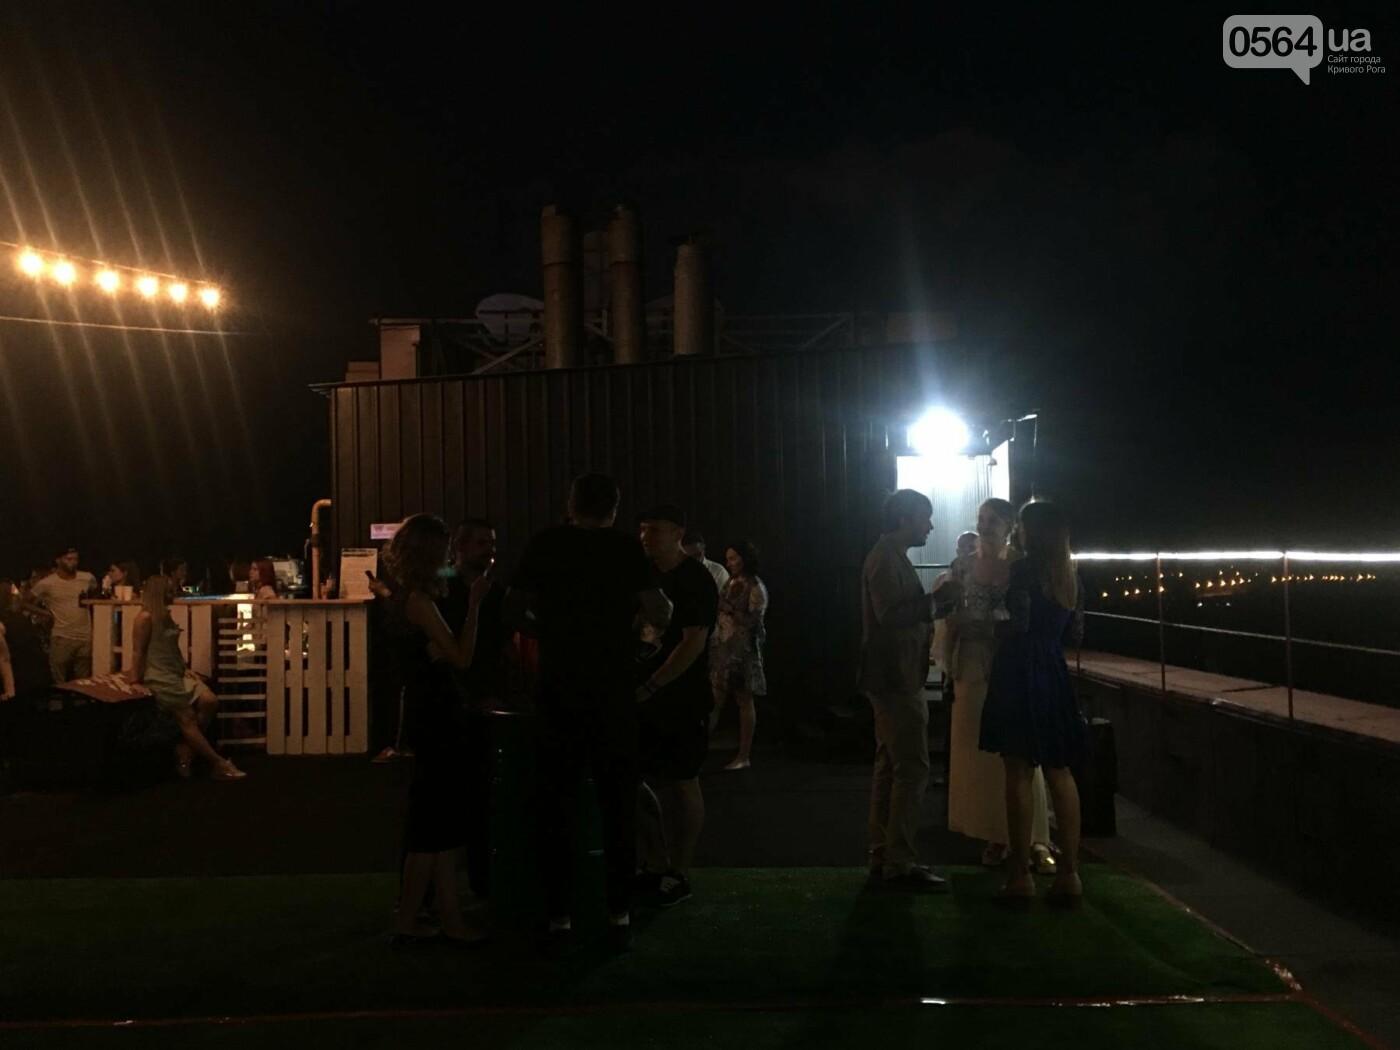 Сотни криворожан встречали закат на крыше отеля под мелодии джаза, - ФОТО, ВИДЕО, фото-22